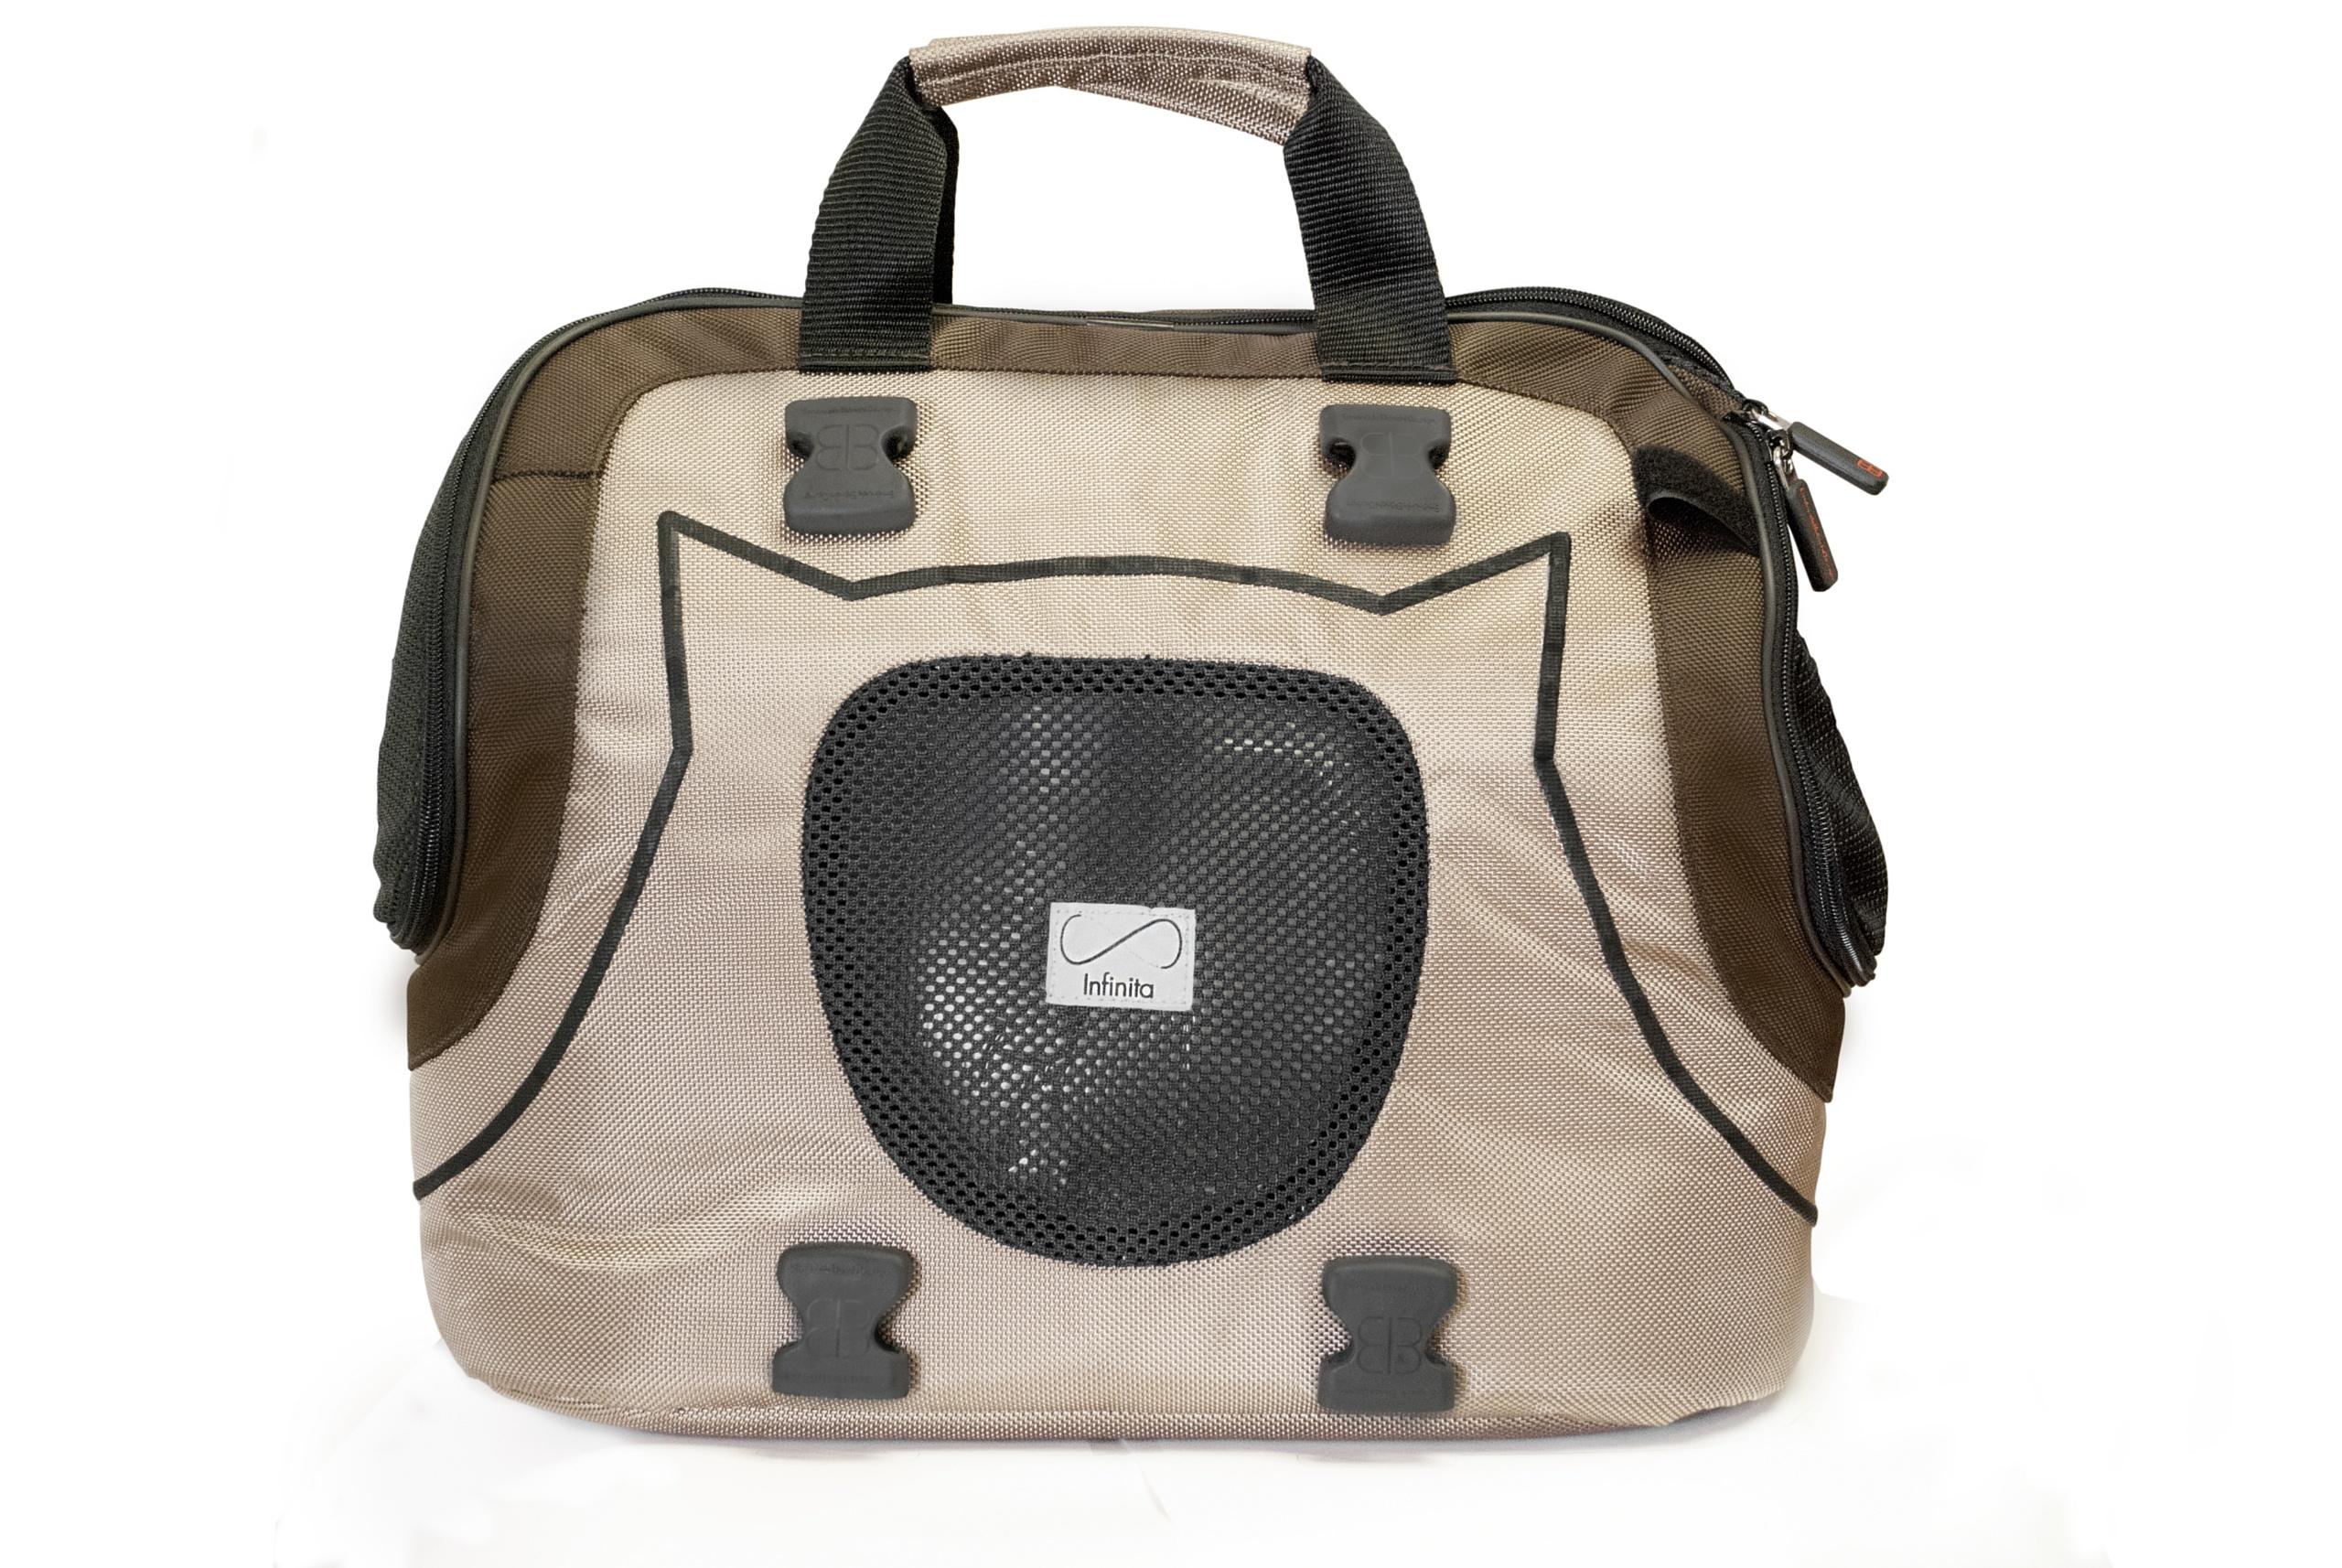 Emanuele Bianchi Design Infinita Universal Sport Bag/Carrier for Pets, Tan/Brown